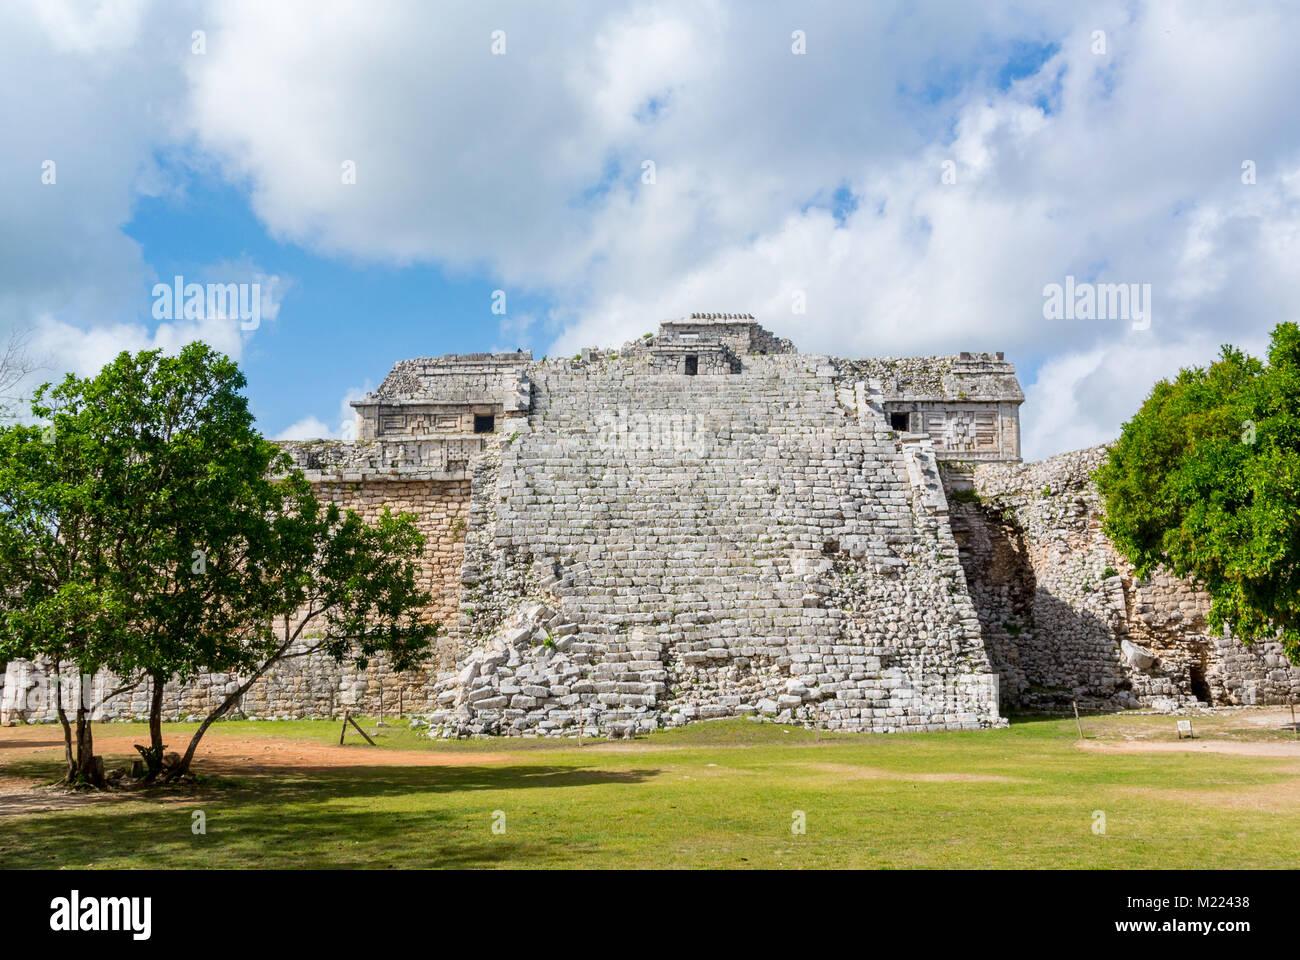 Kukulkan Temple Pyramid, Chichen Itza, Yucatan, Mexic - Stock Image